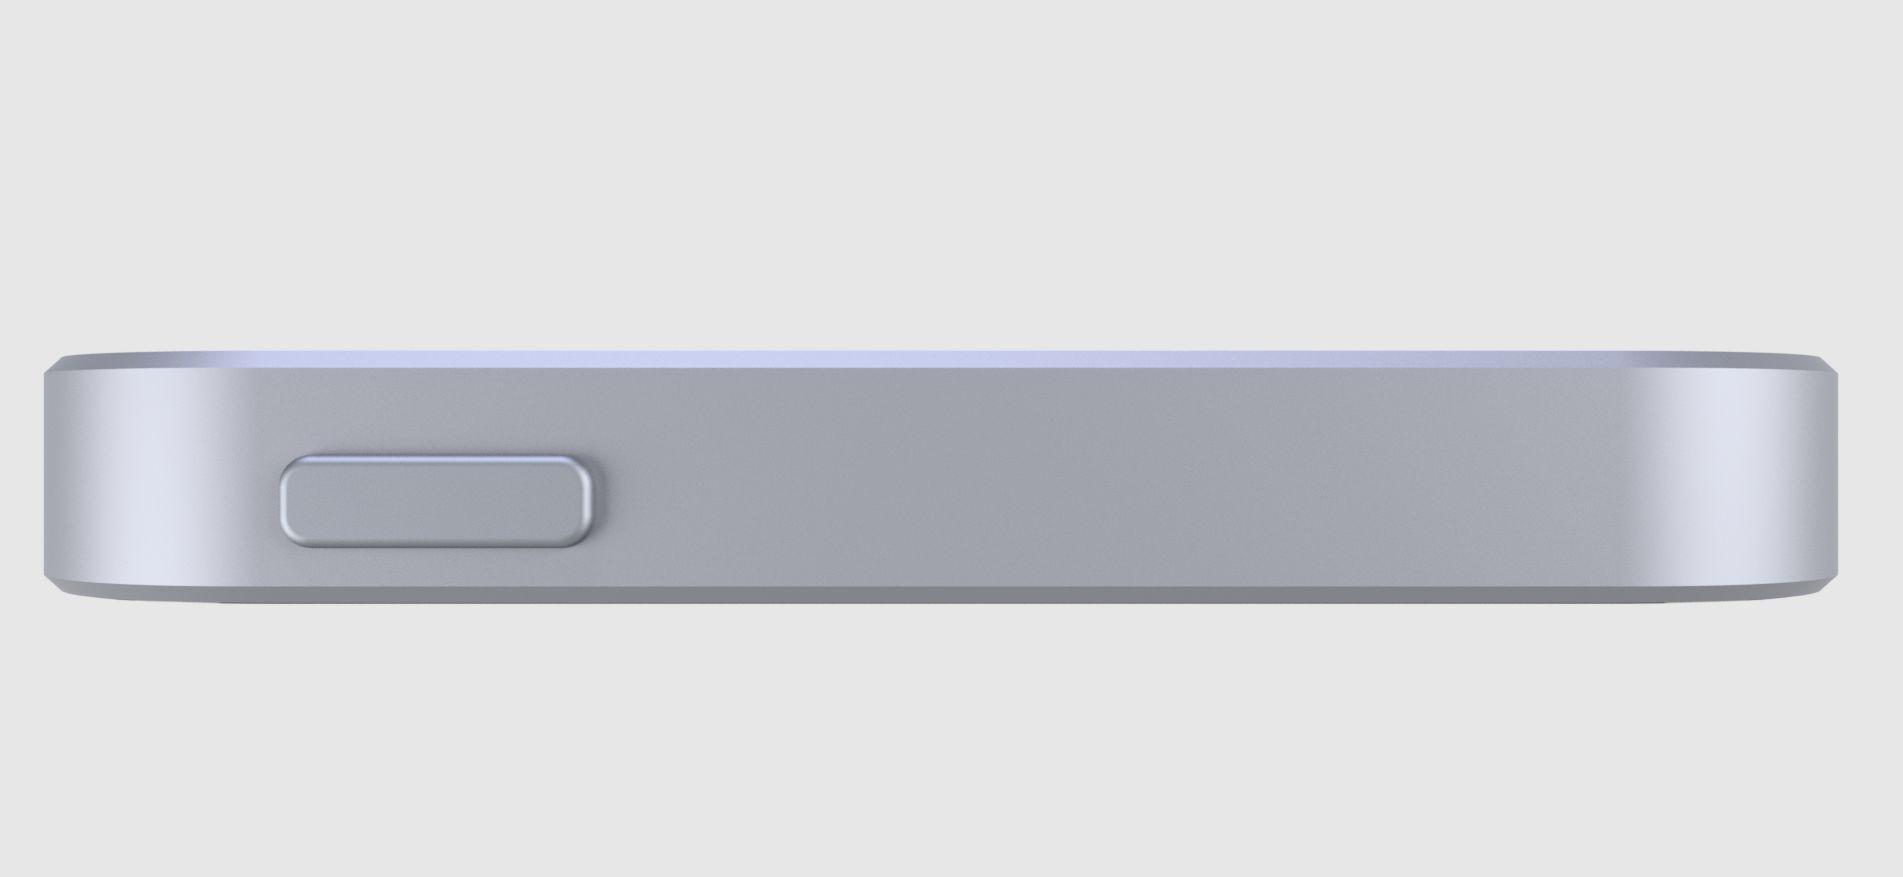 Iphone-5-v6-3500-3500